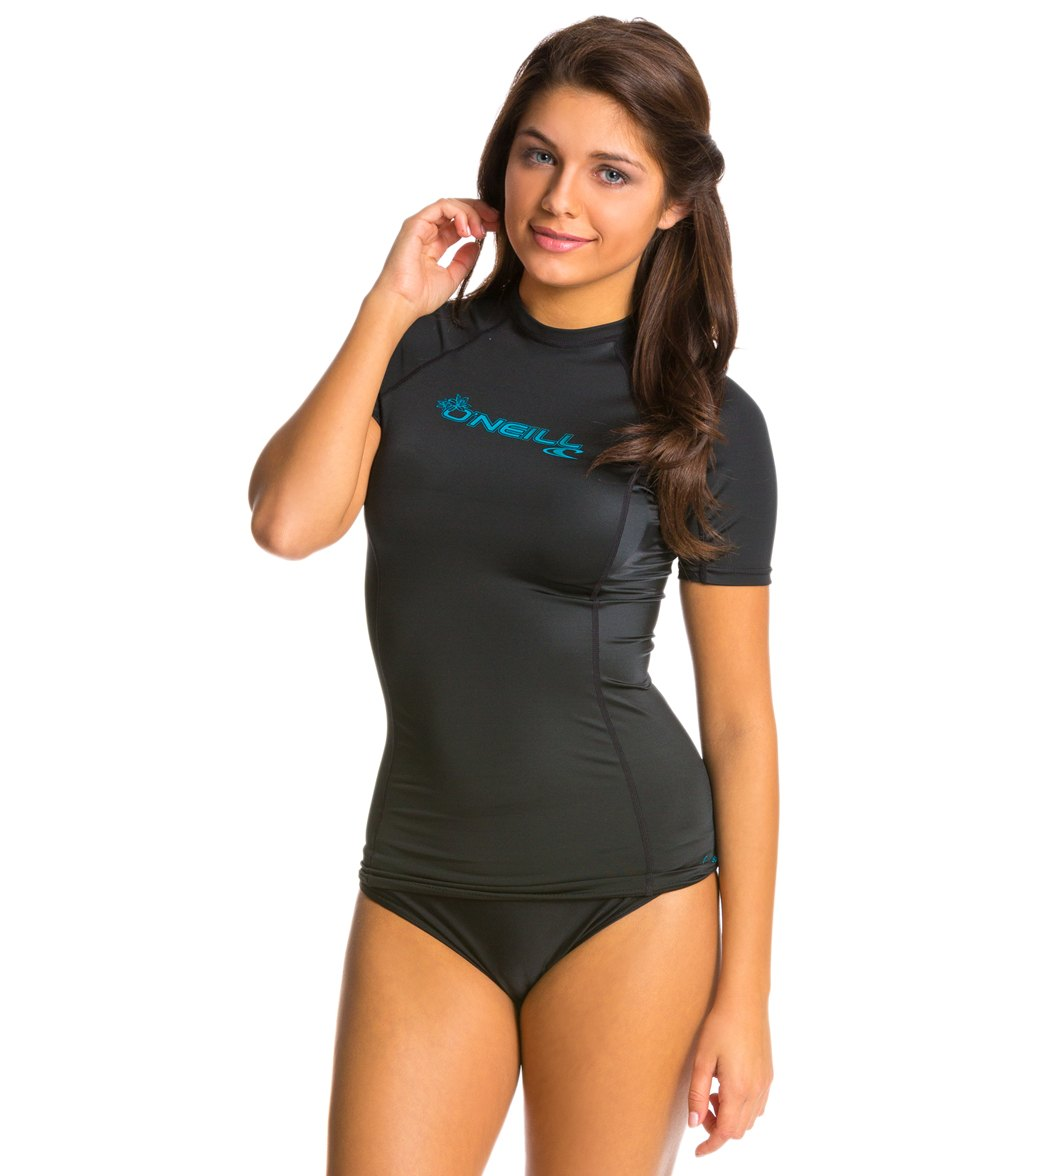 ONeill Wetsuits Womens Rash Guard